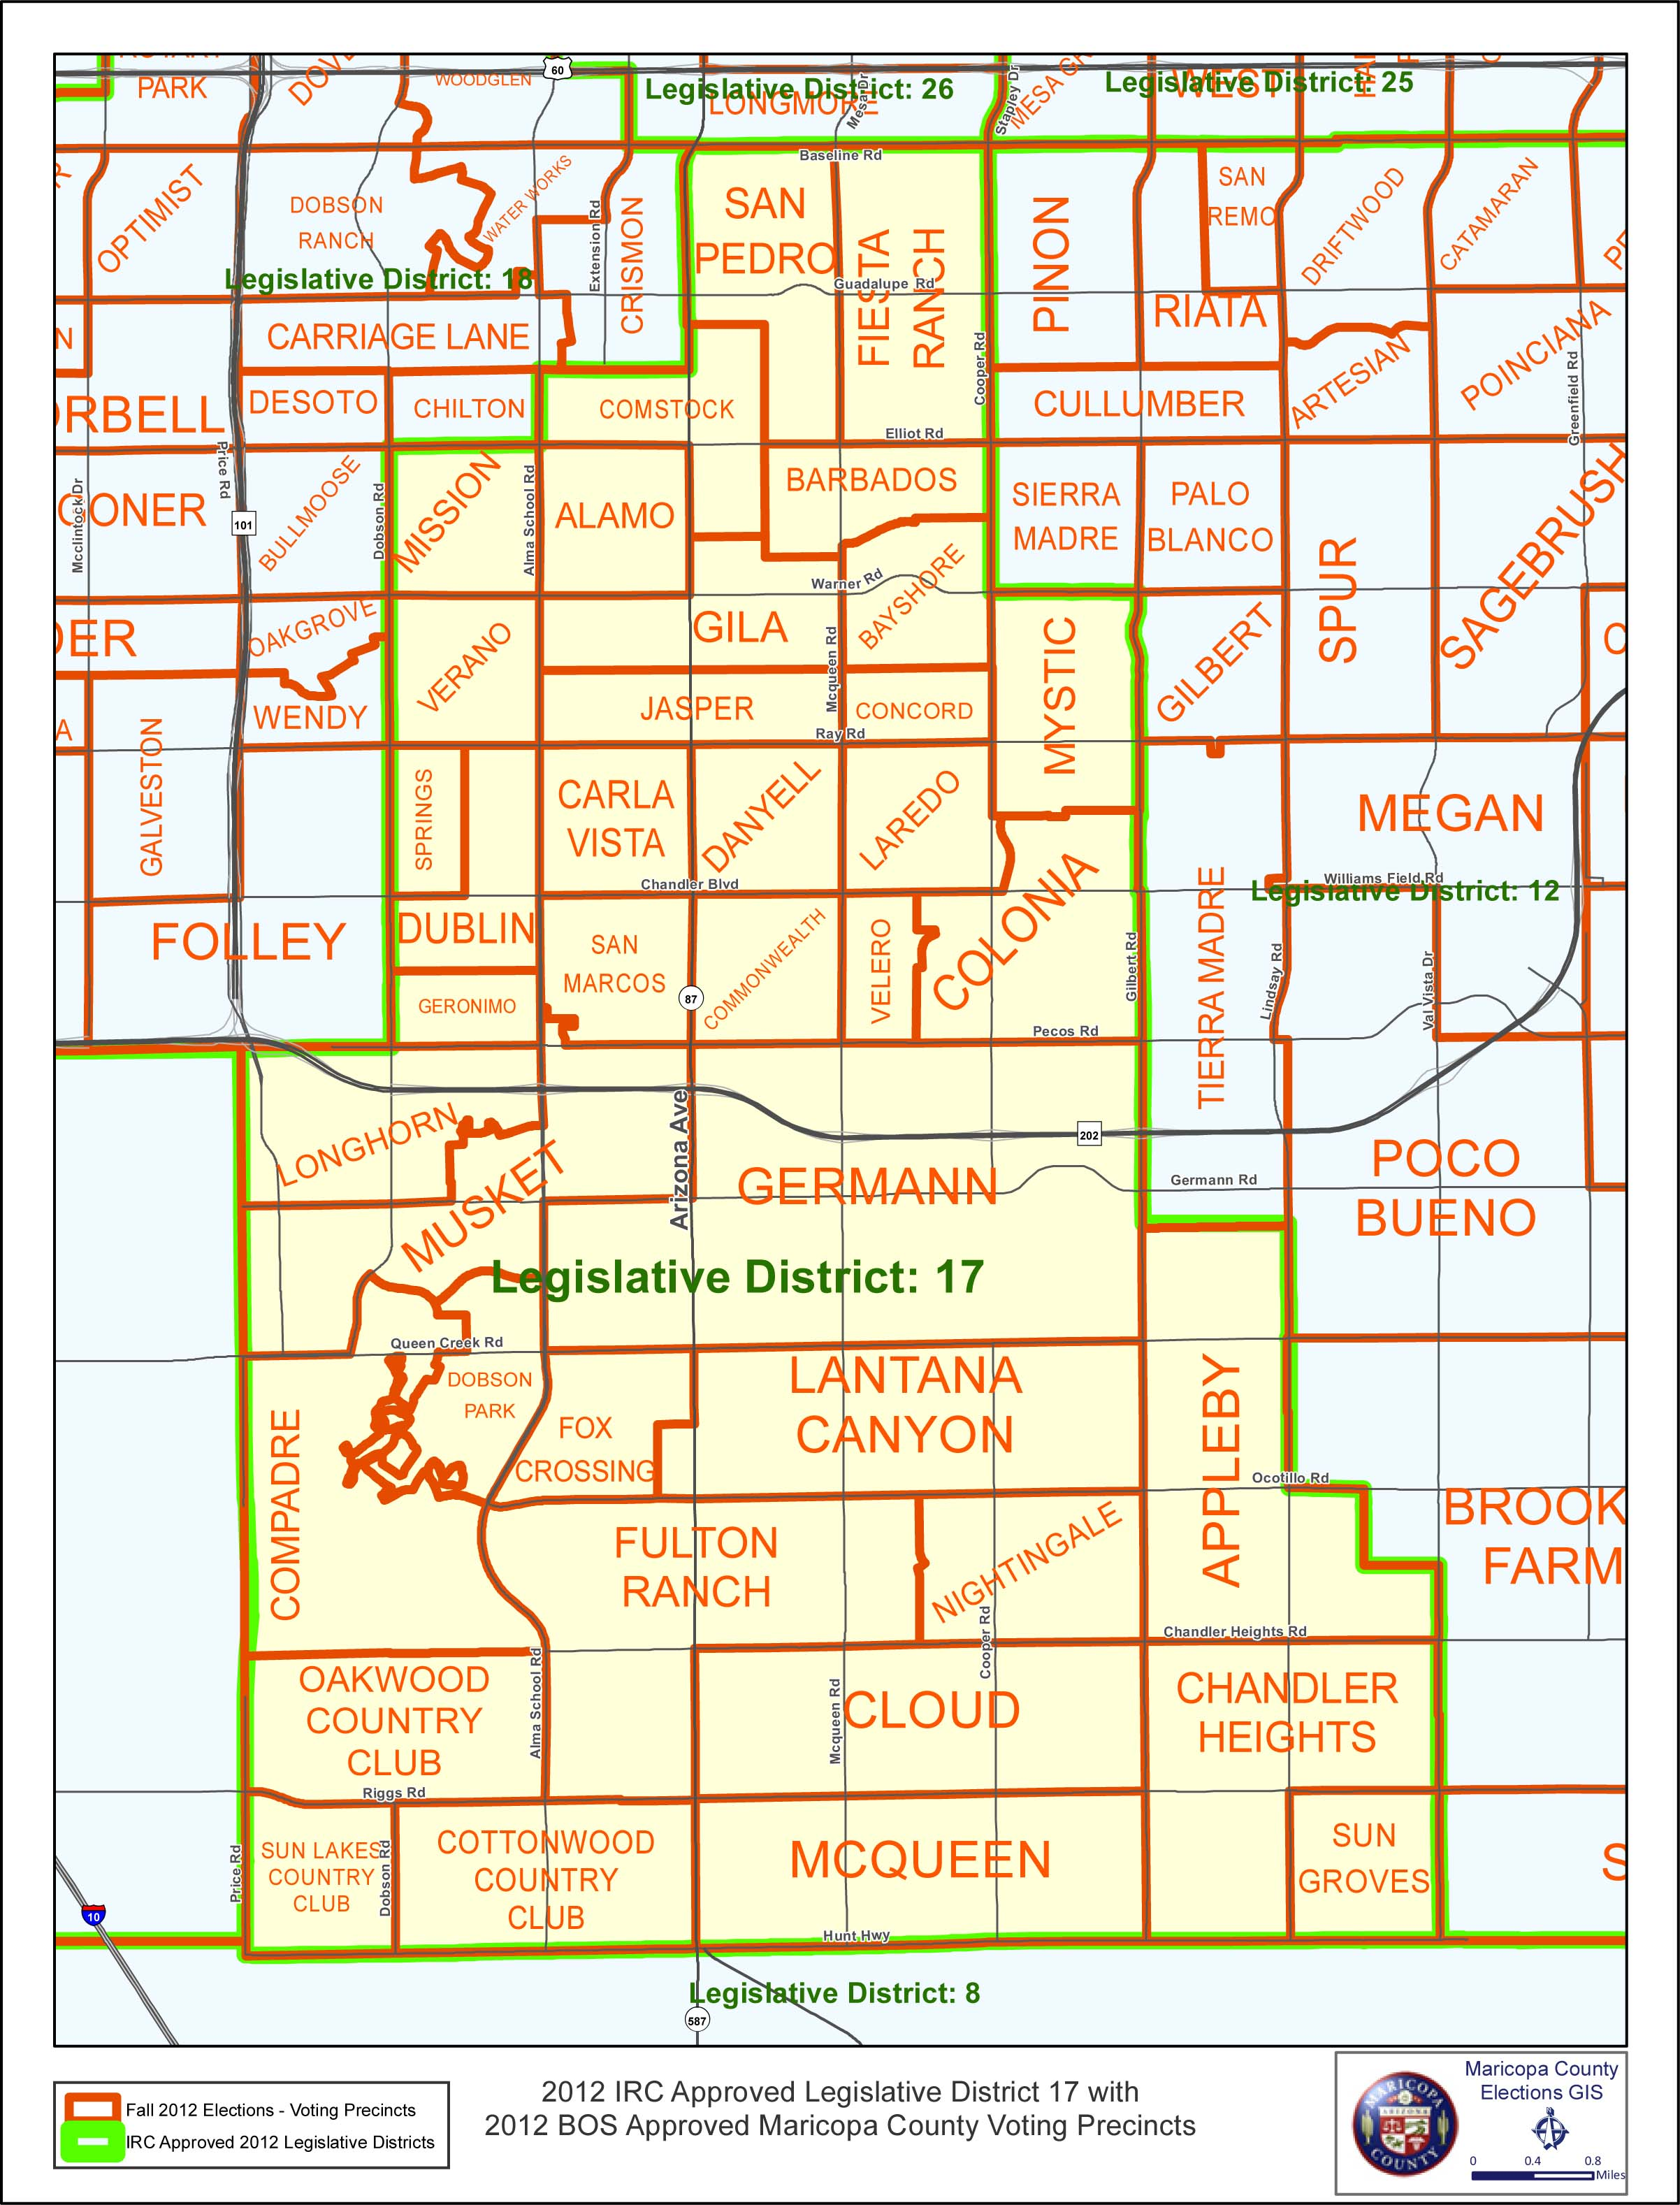 Map Of Arizona Legislative Districts.Legislative District 17 Map Legislative District 17 Democrats